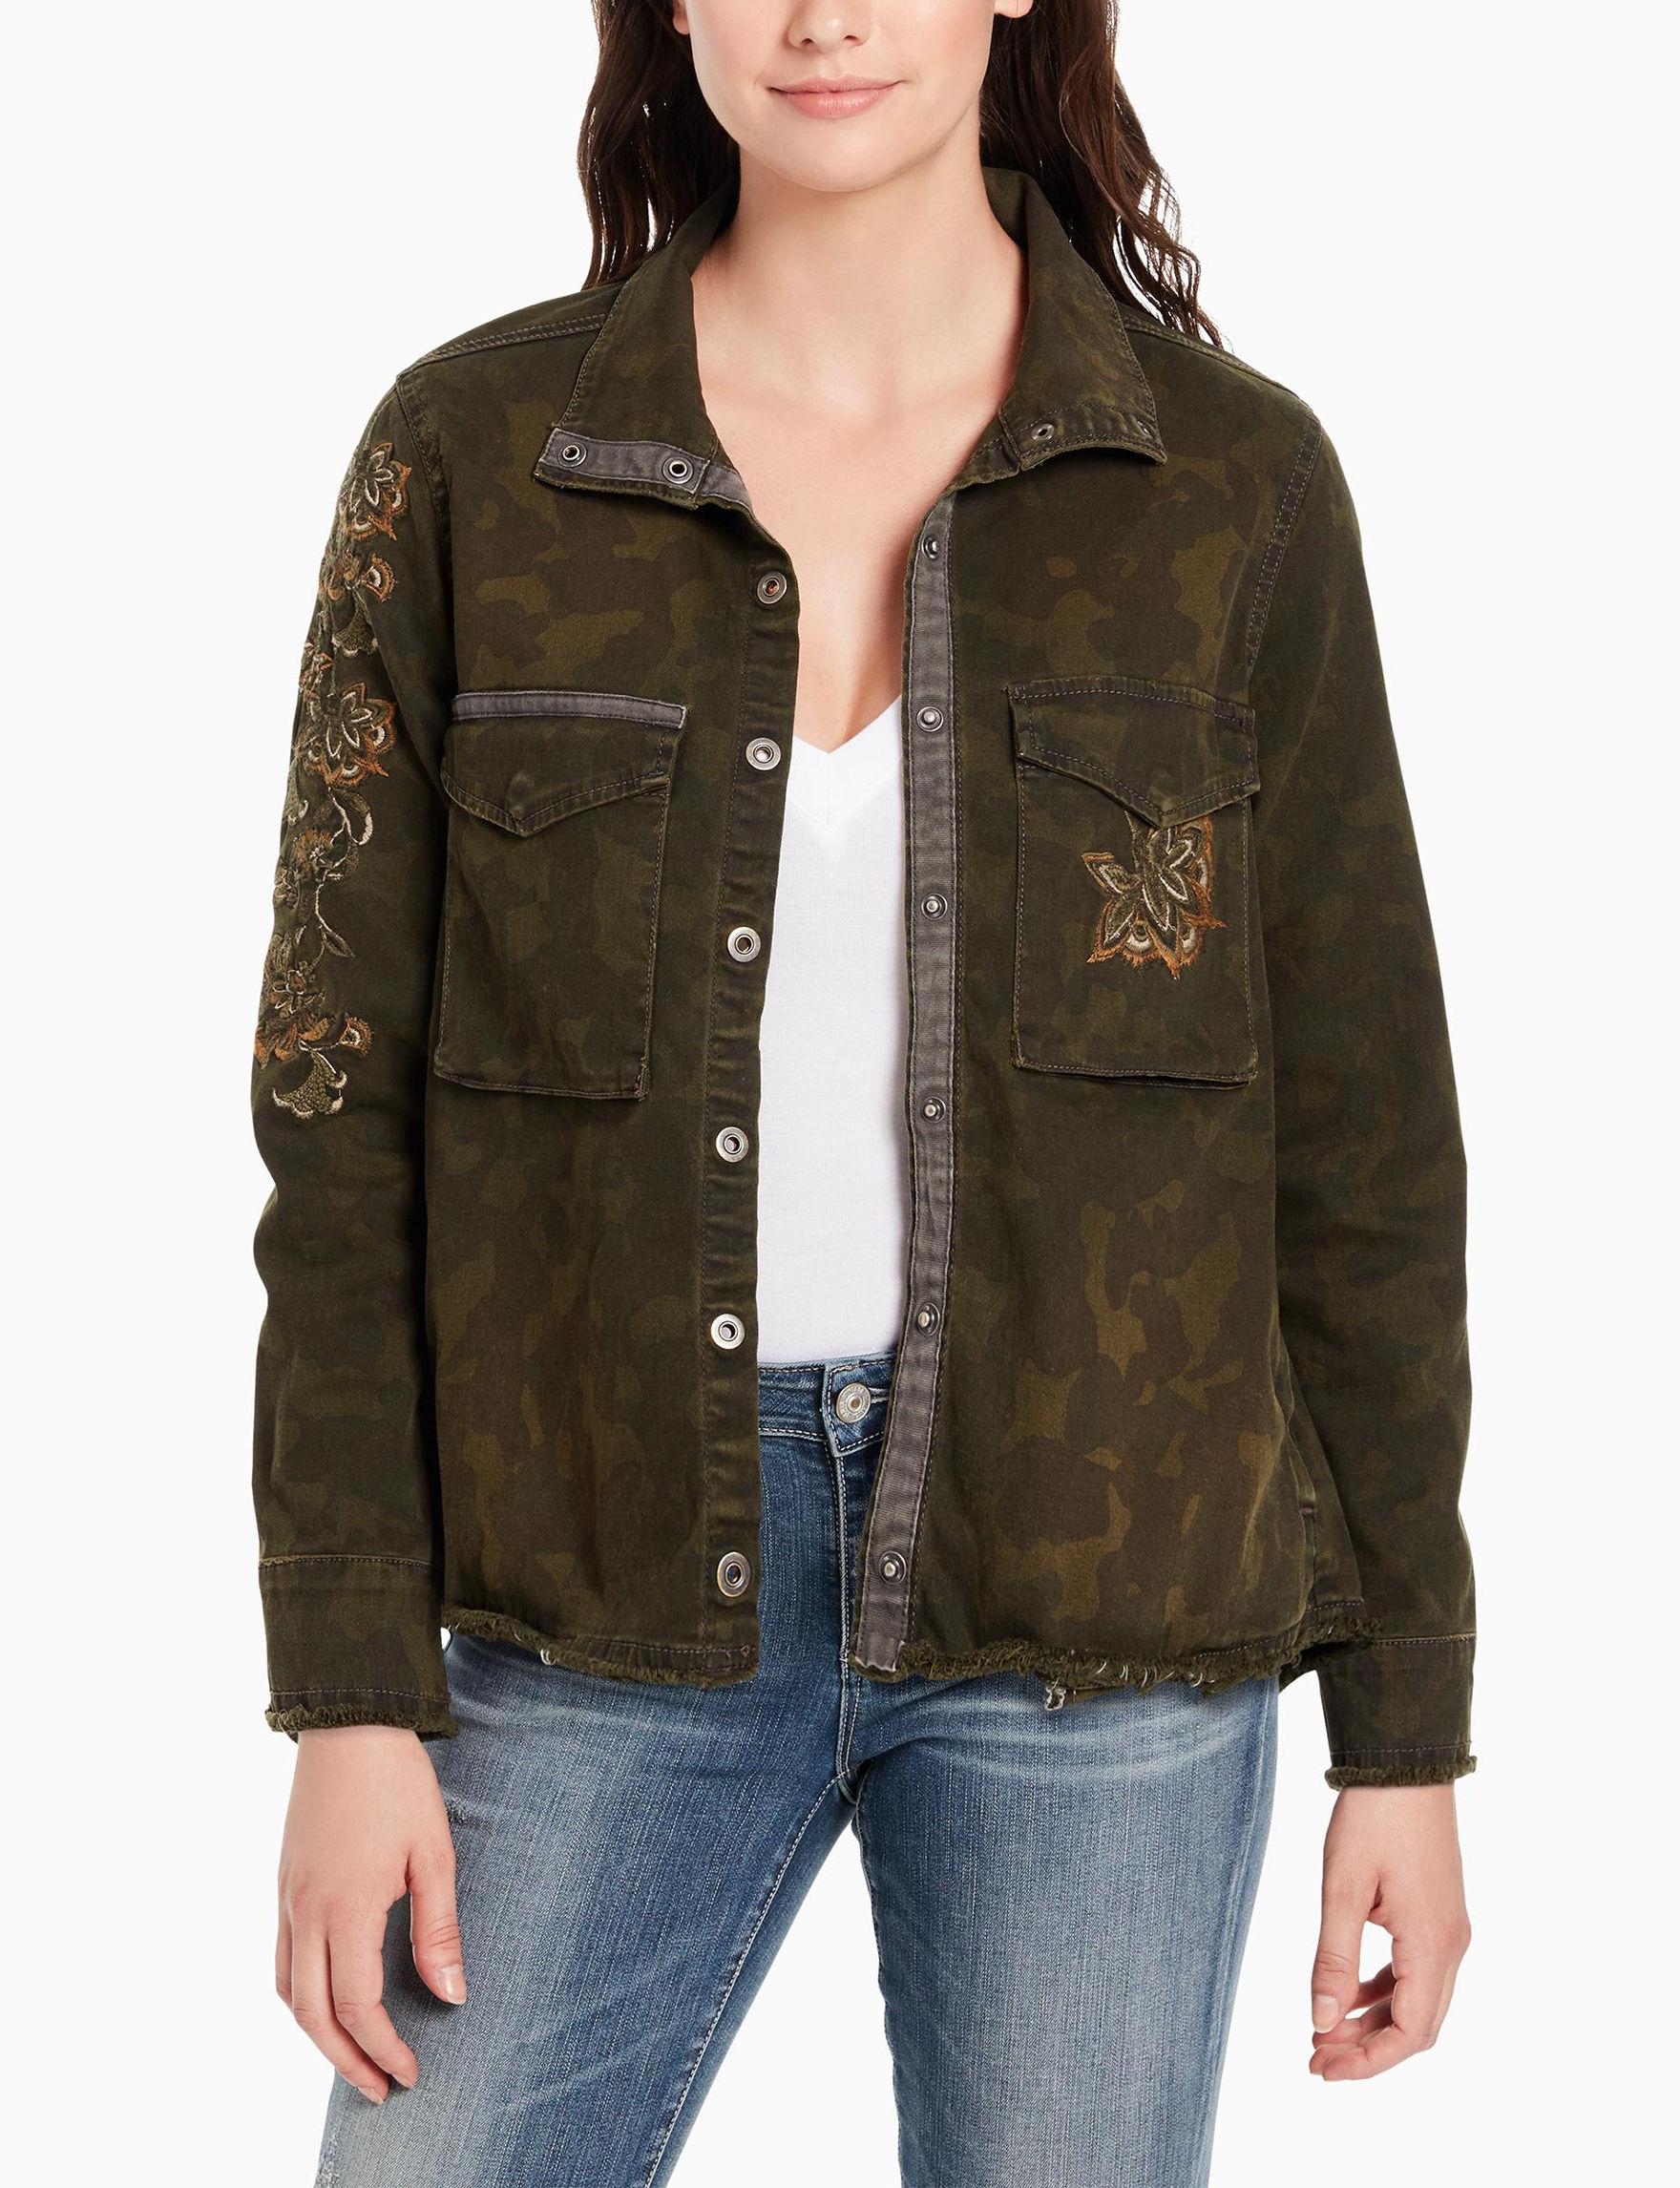 Vintage America Blues Green Lightweight Jackets & Blazers Shirts & Blouses